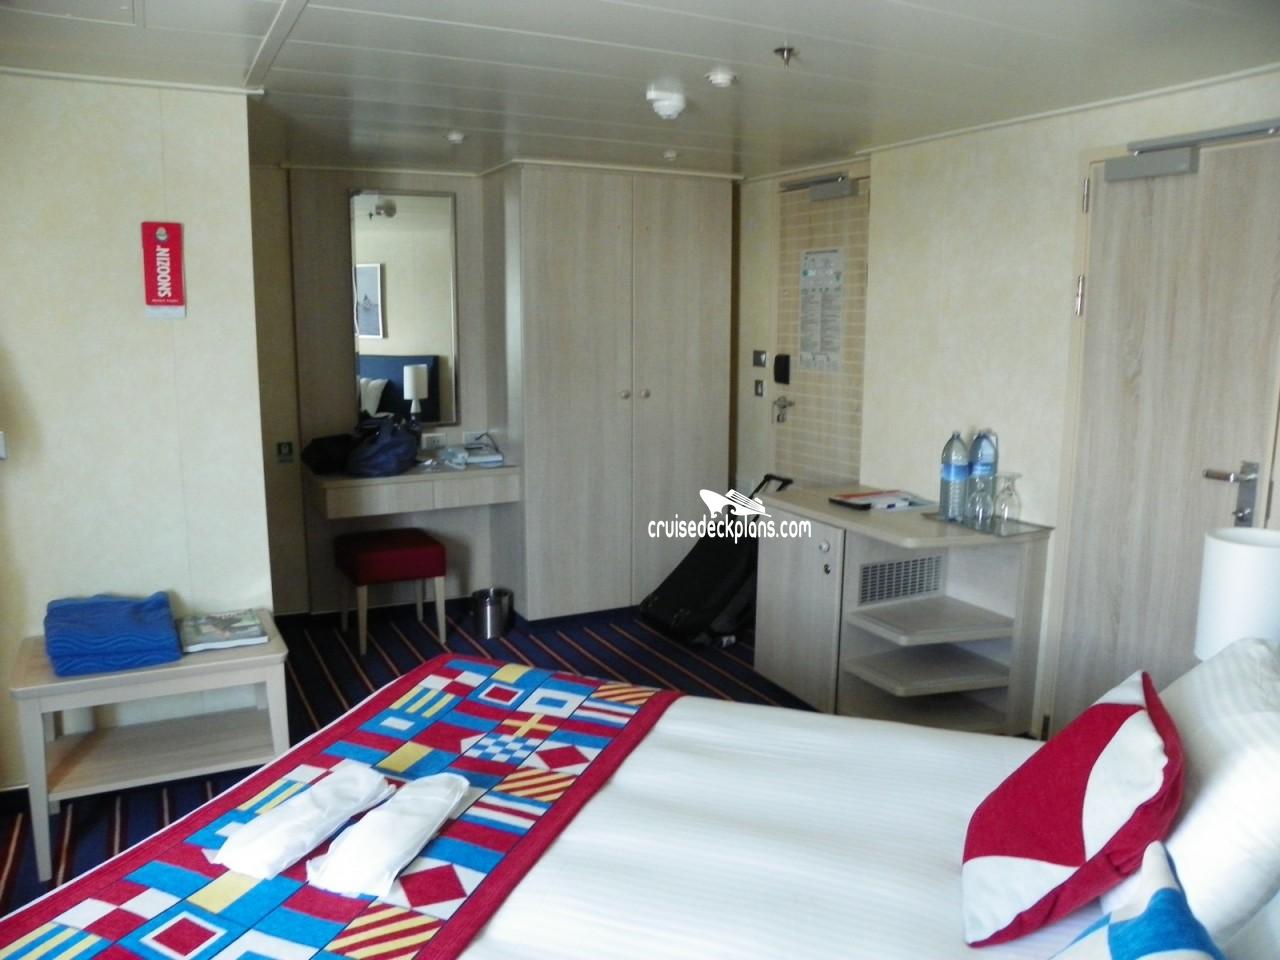 Carnival Vista Deluxe Oceanview Stateroom